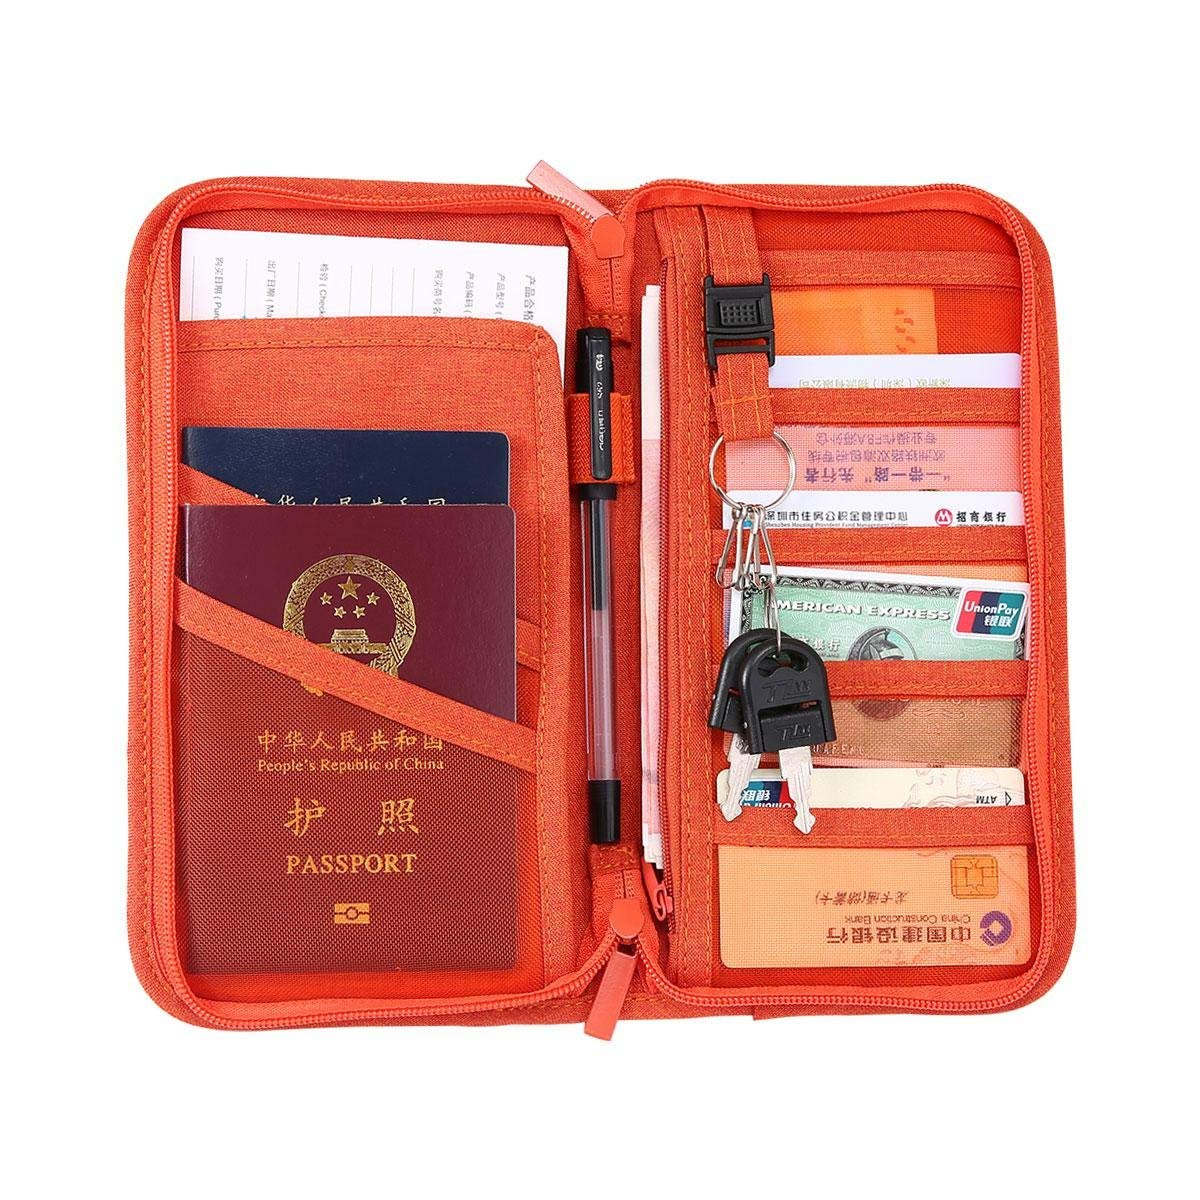 Pink Black Sheep Multi-purpose Travel Passport Set With Storage Bag Leather Passport Holder Passport Holder With Passport Holder Travel Wallet